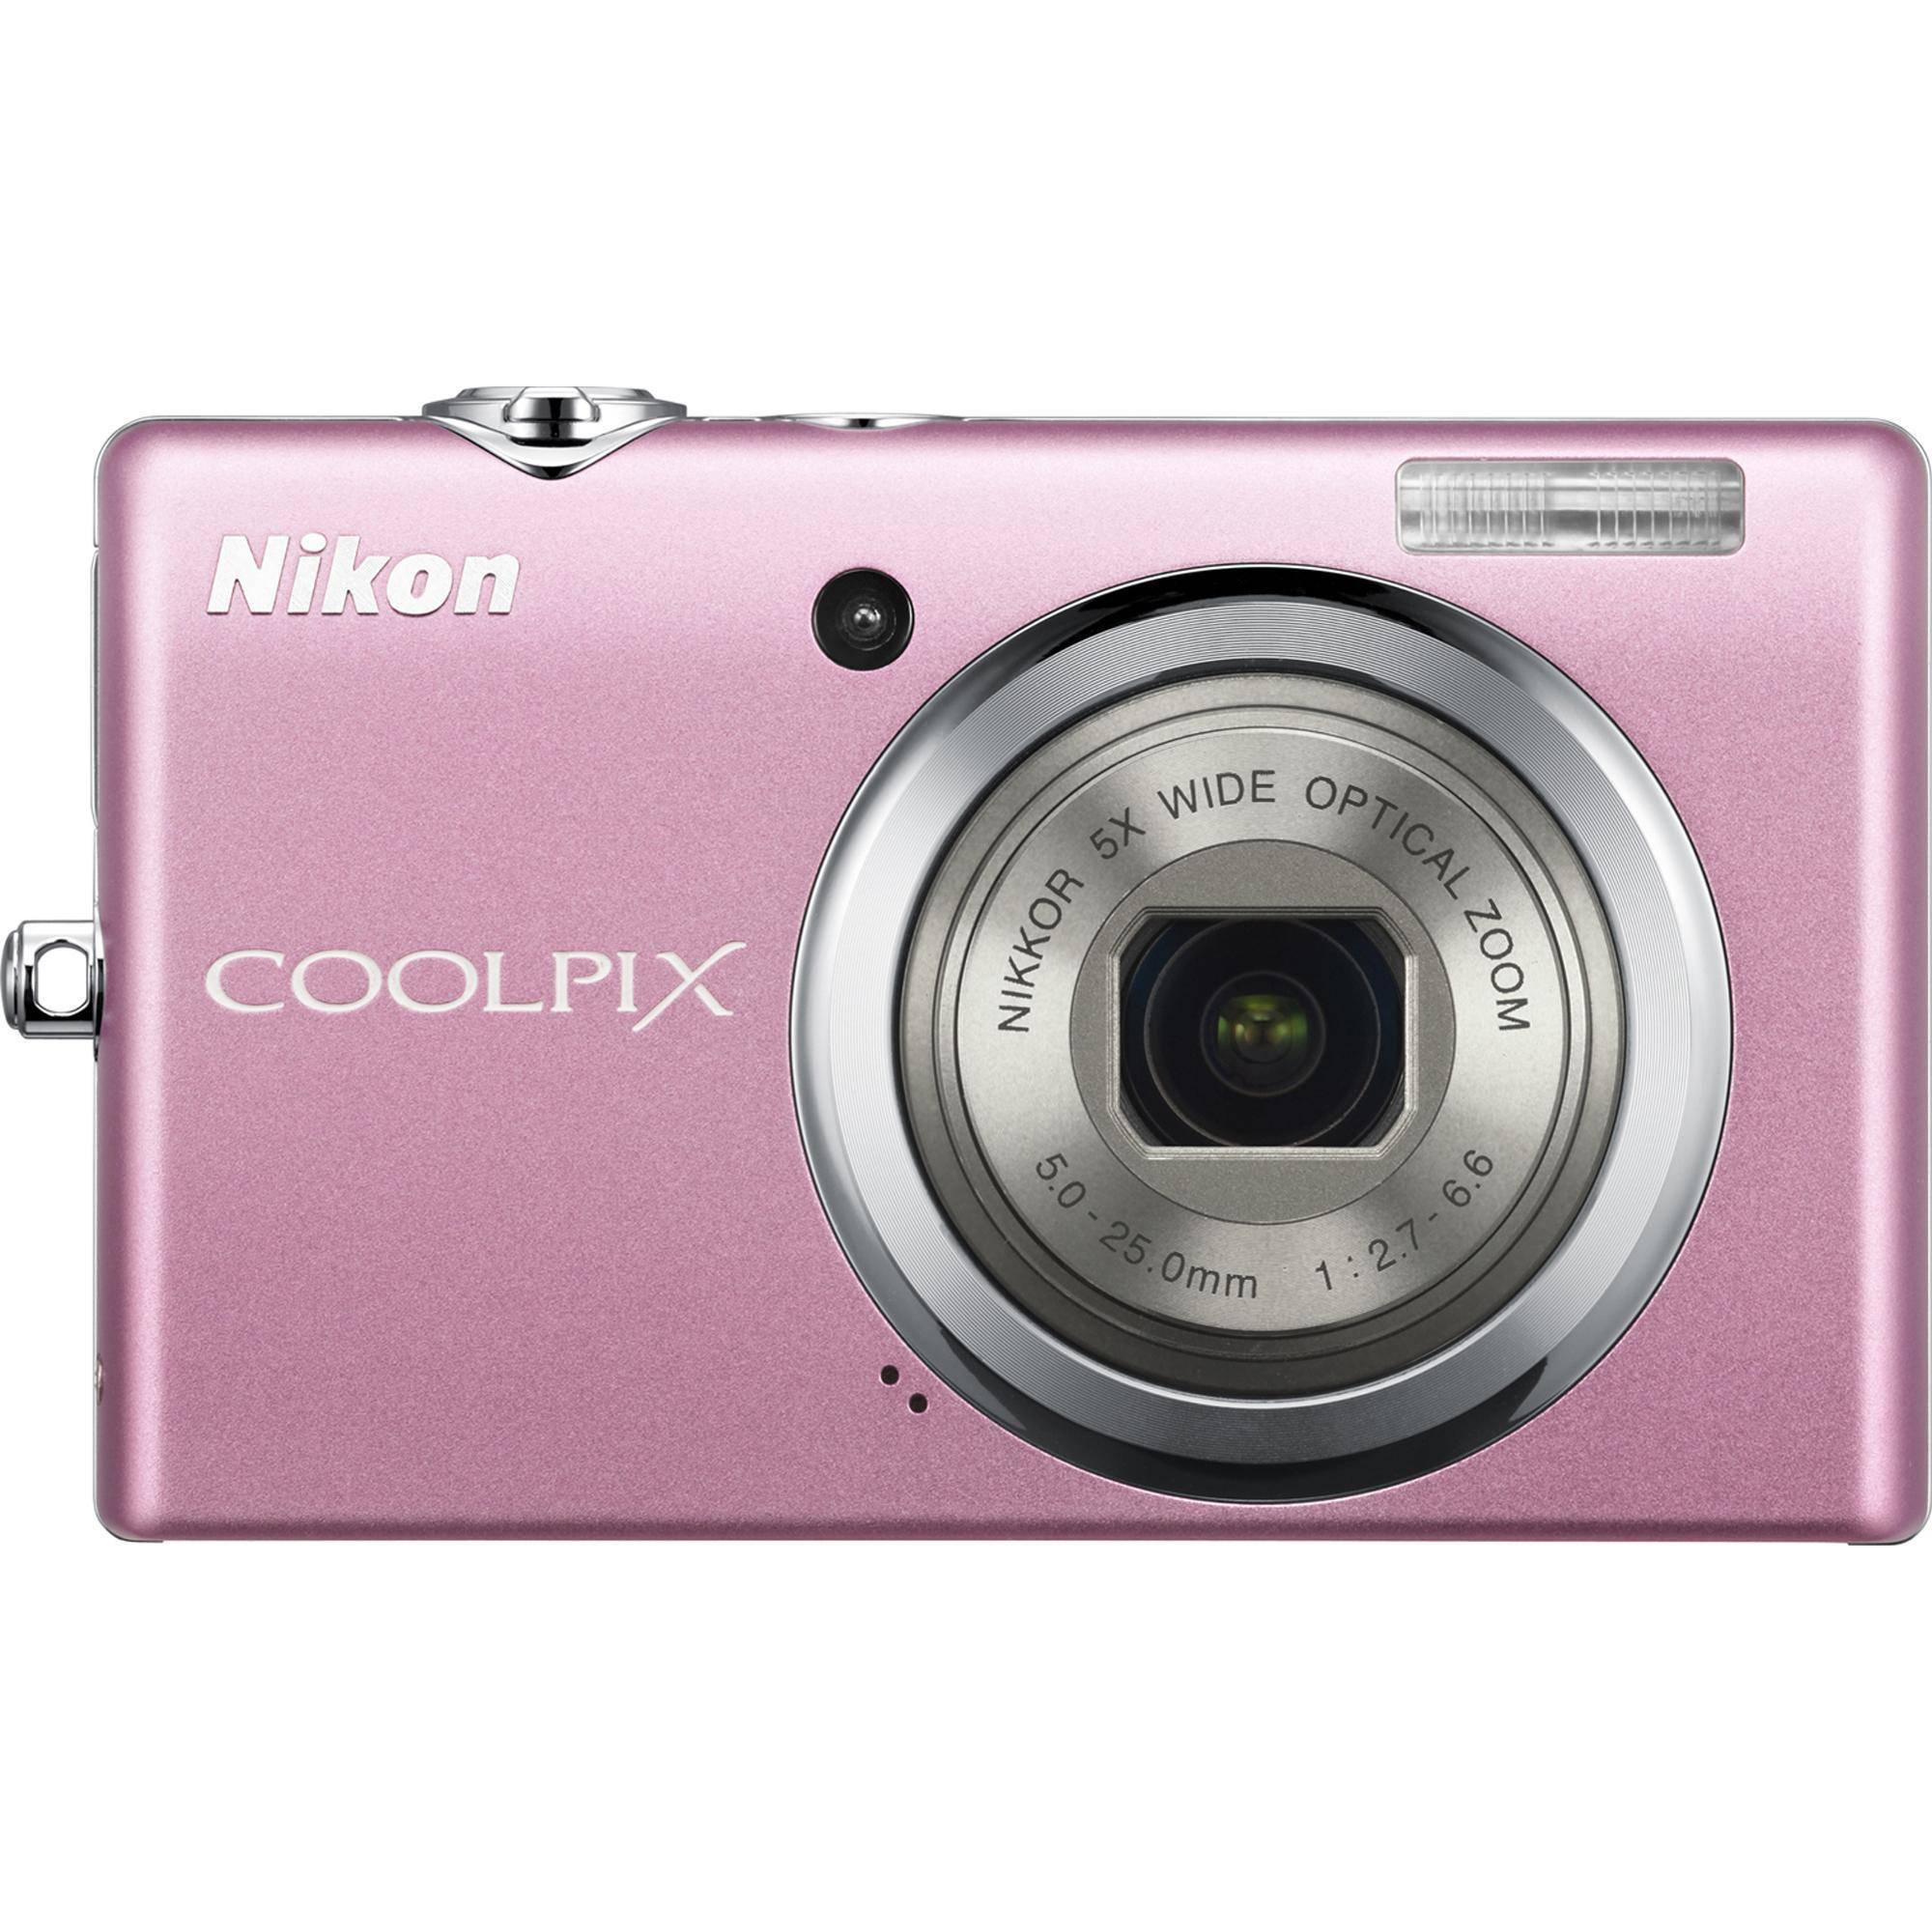 Nikon CoolPix S570 Digital Camera (Pink) 26181 B&H Photo Video